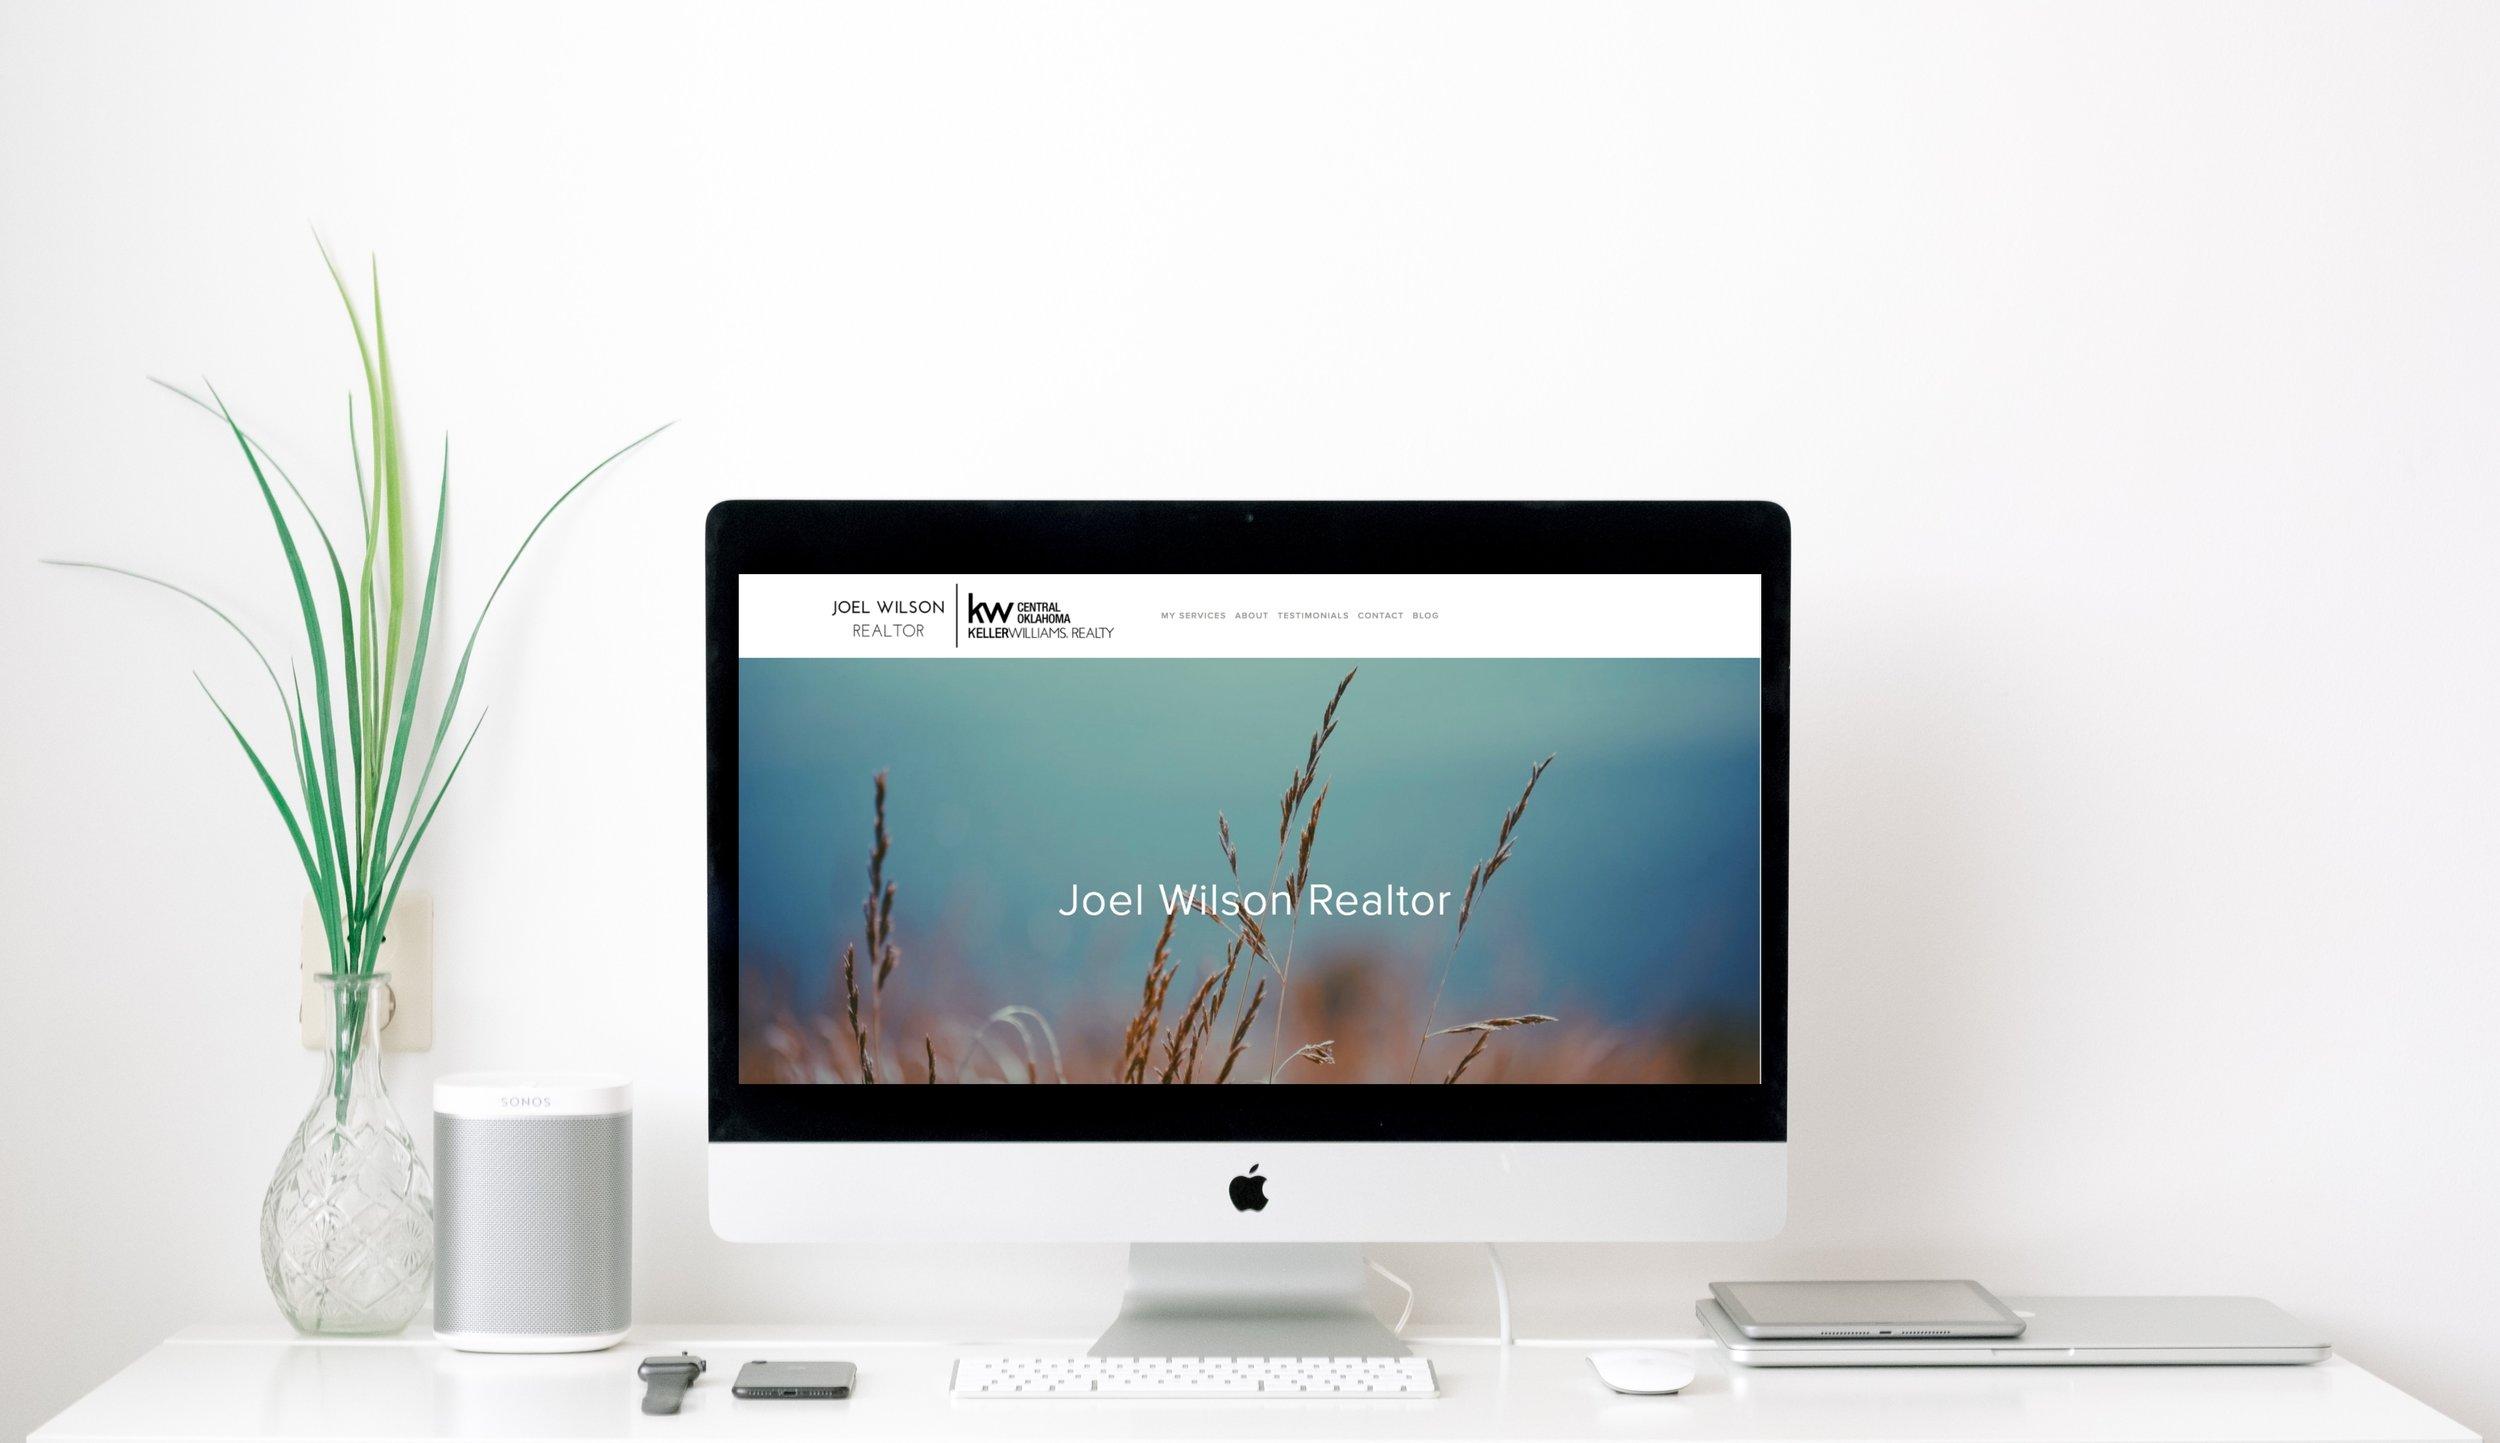 Joel Wilson Realtor - Website